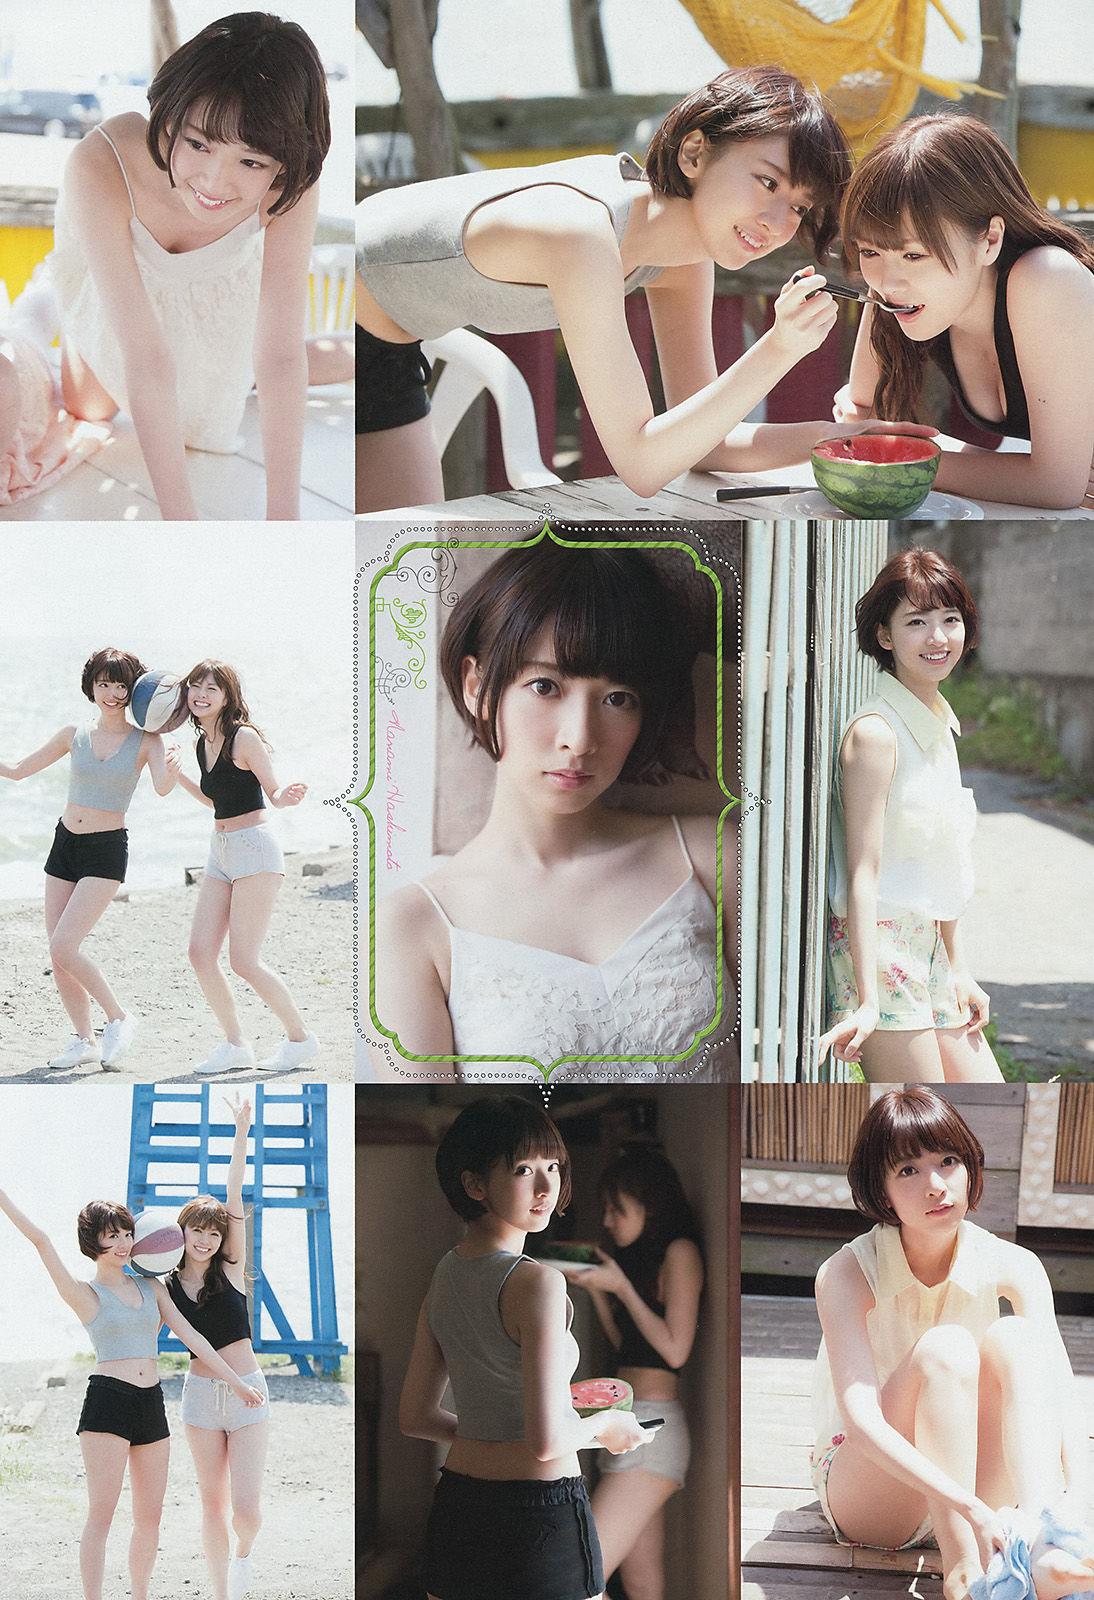 [Weekly Big Comic Spirits杂志写真]桥本奈奈未超高清写真大图片(8P)|485热度